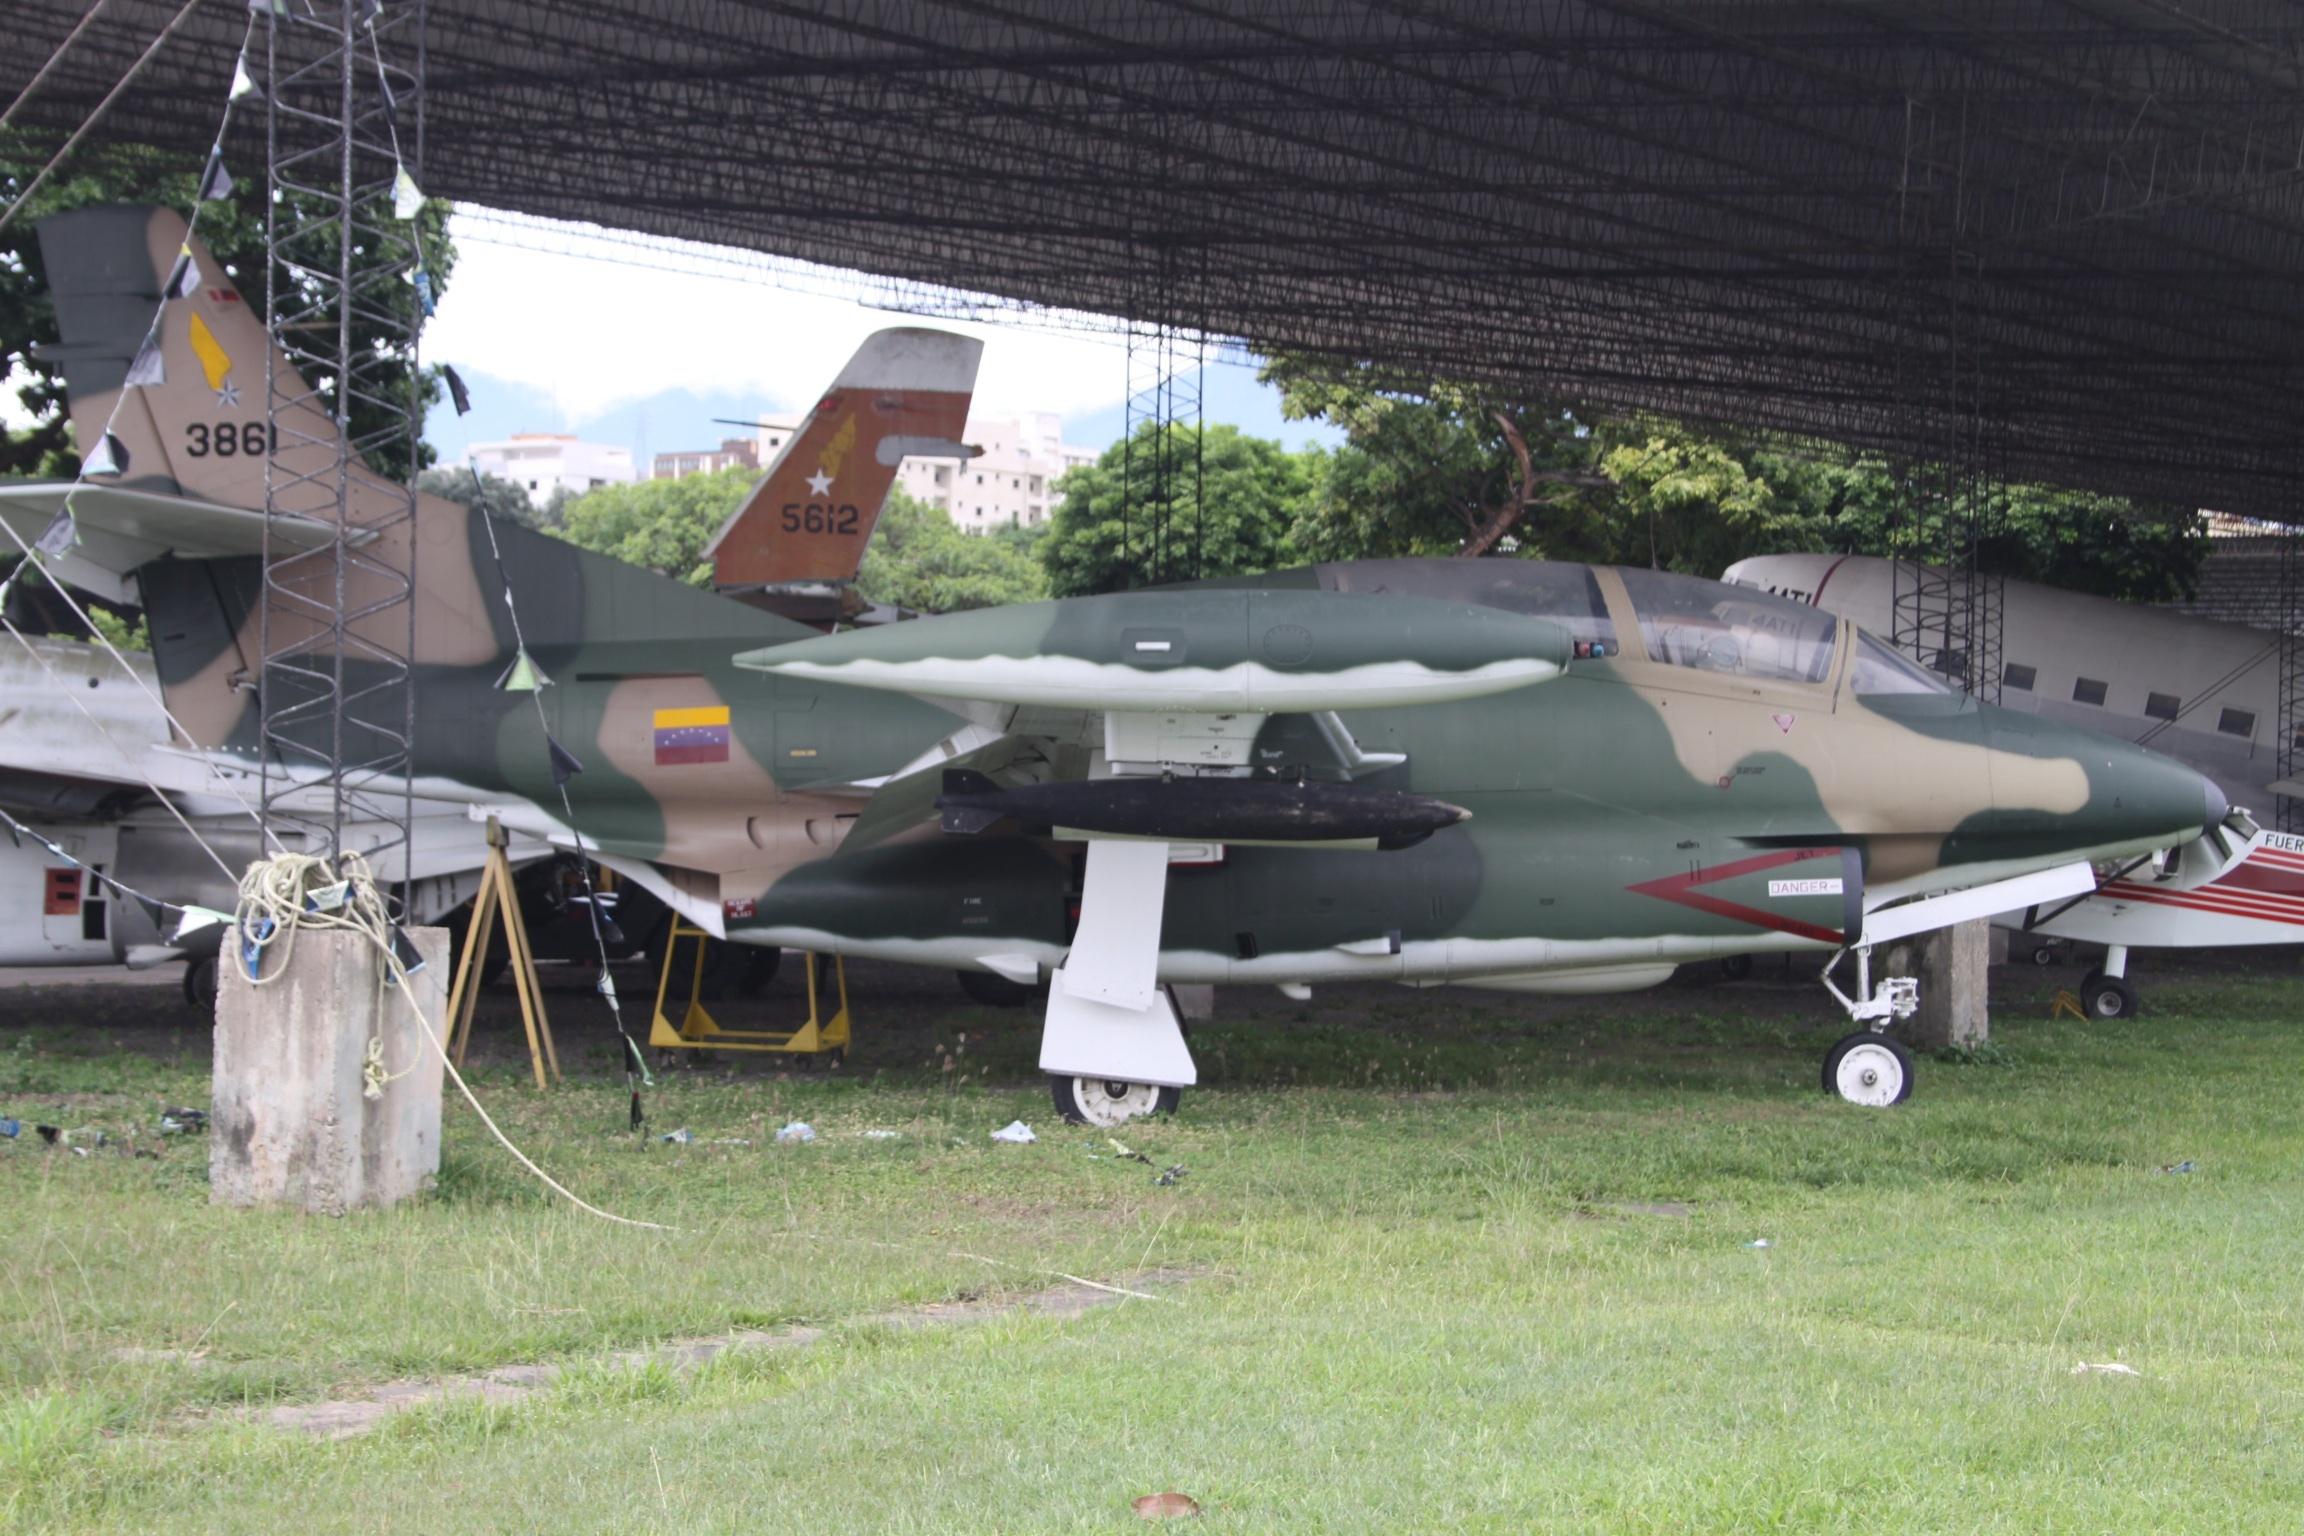 File:3861 Rockwell T-2 Buckeye Venezuela Airforce (7453195154).jpg